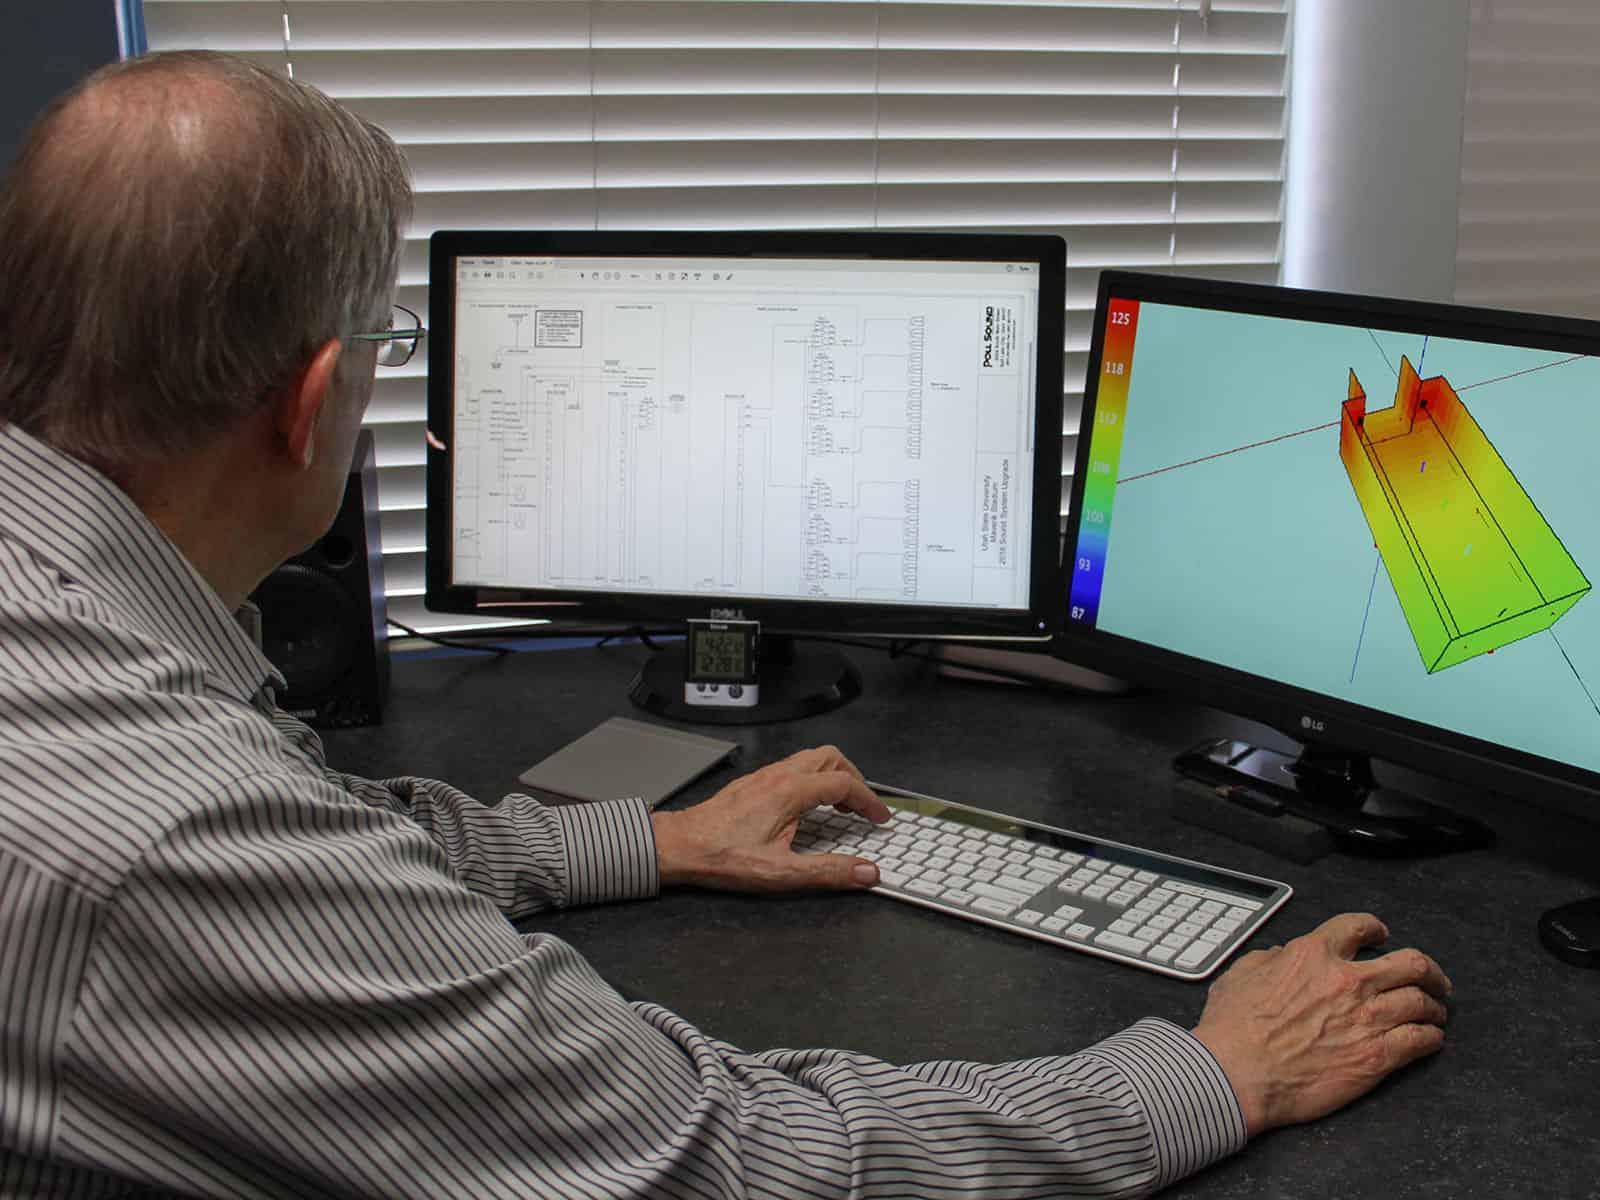 Man designing sound system on computer